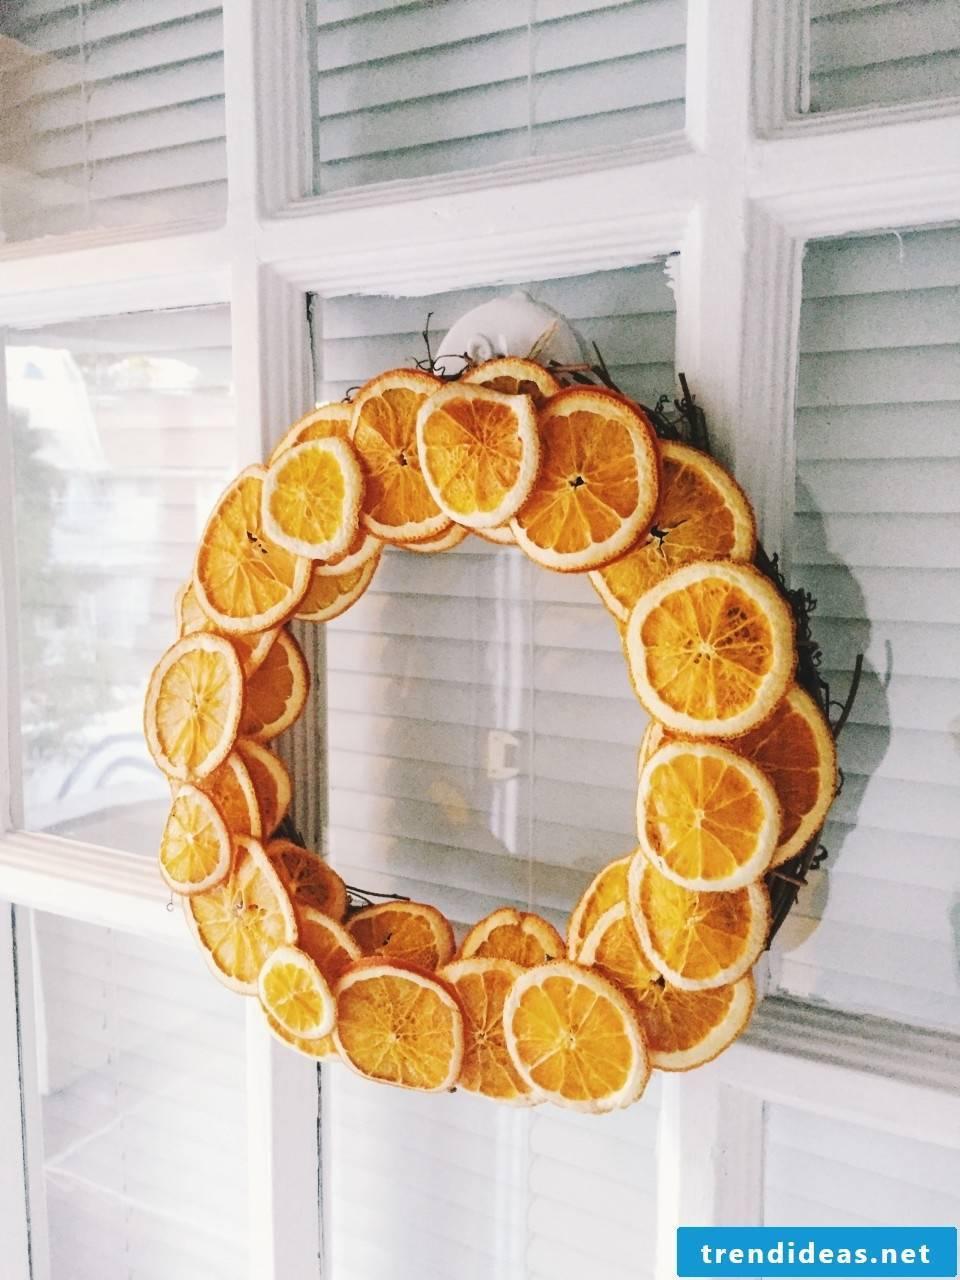 Christmas wreath of dried orange slices